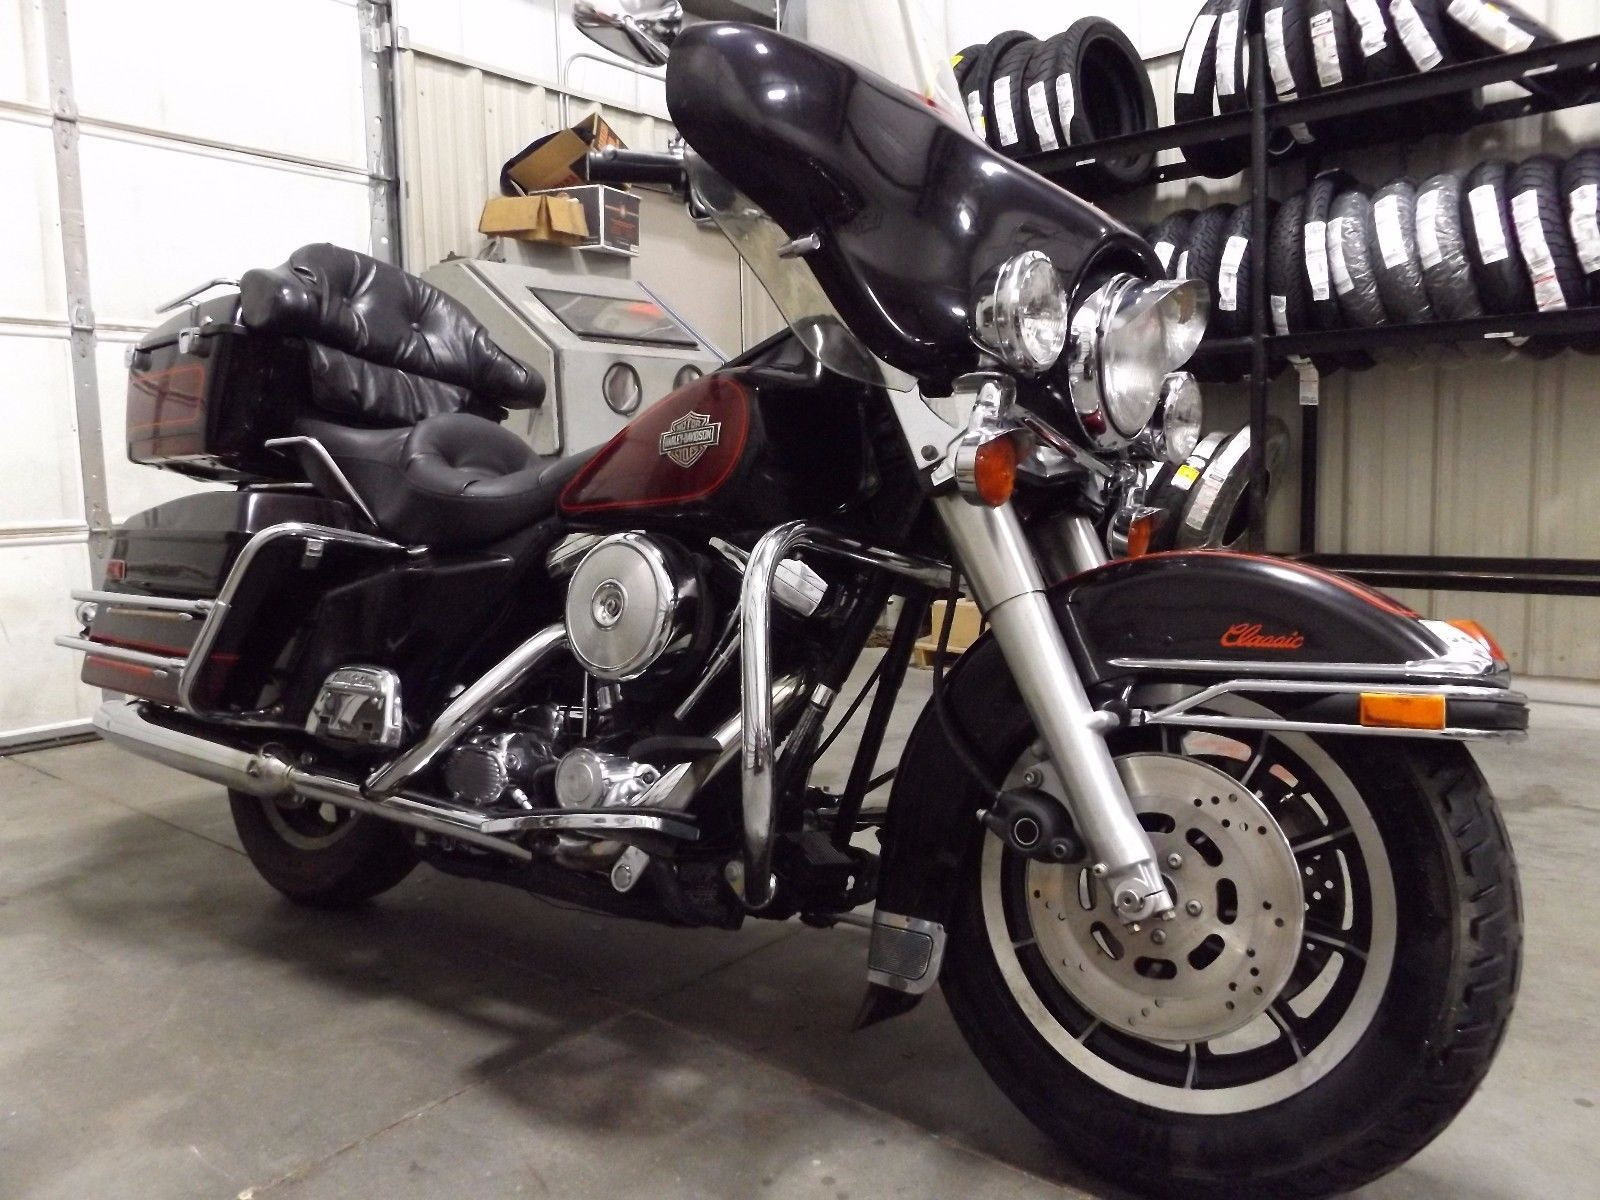 2001 Harley-Davidson Touring | Harley davidson and Clic bikes